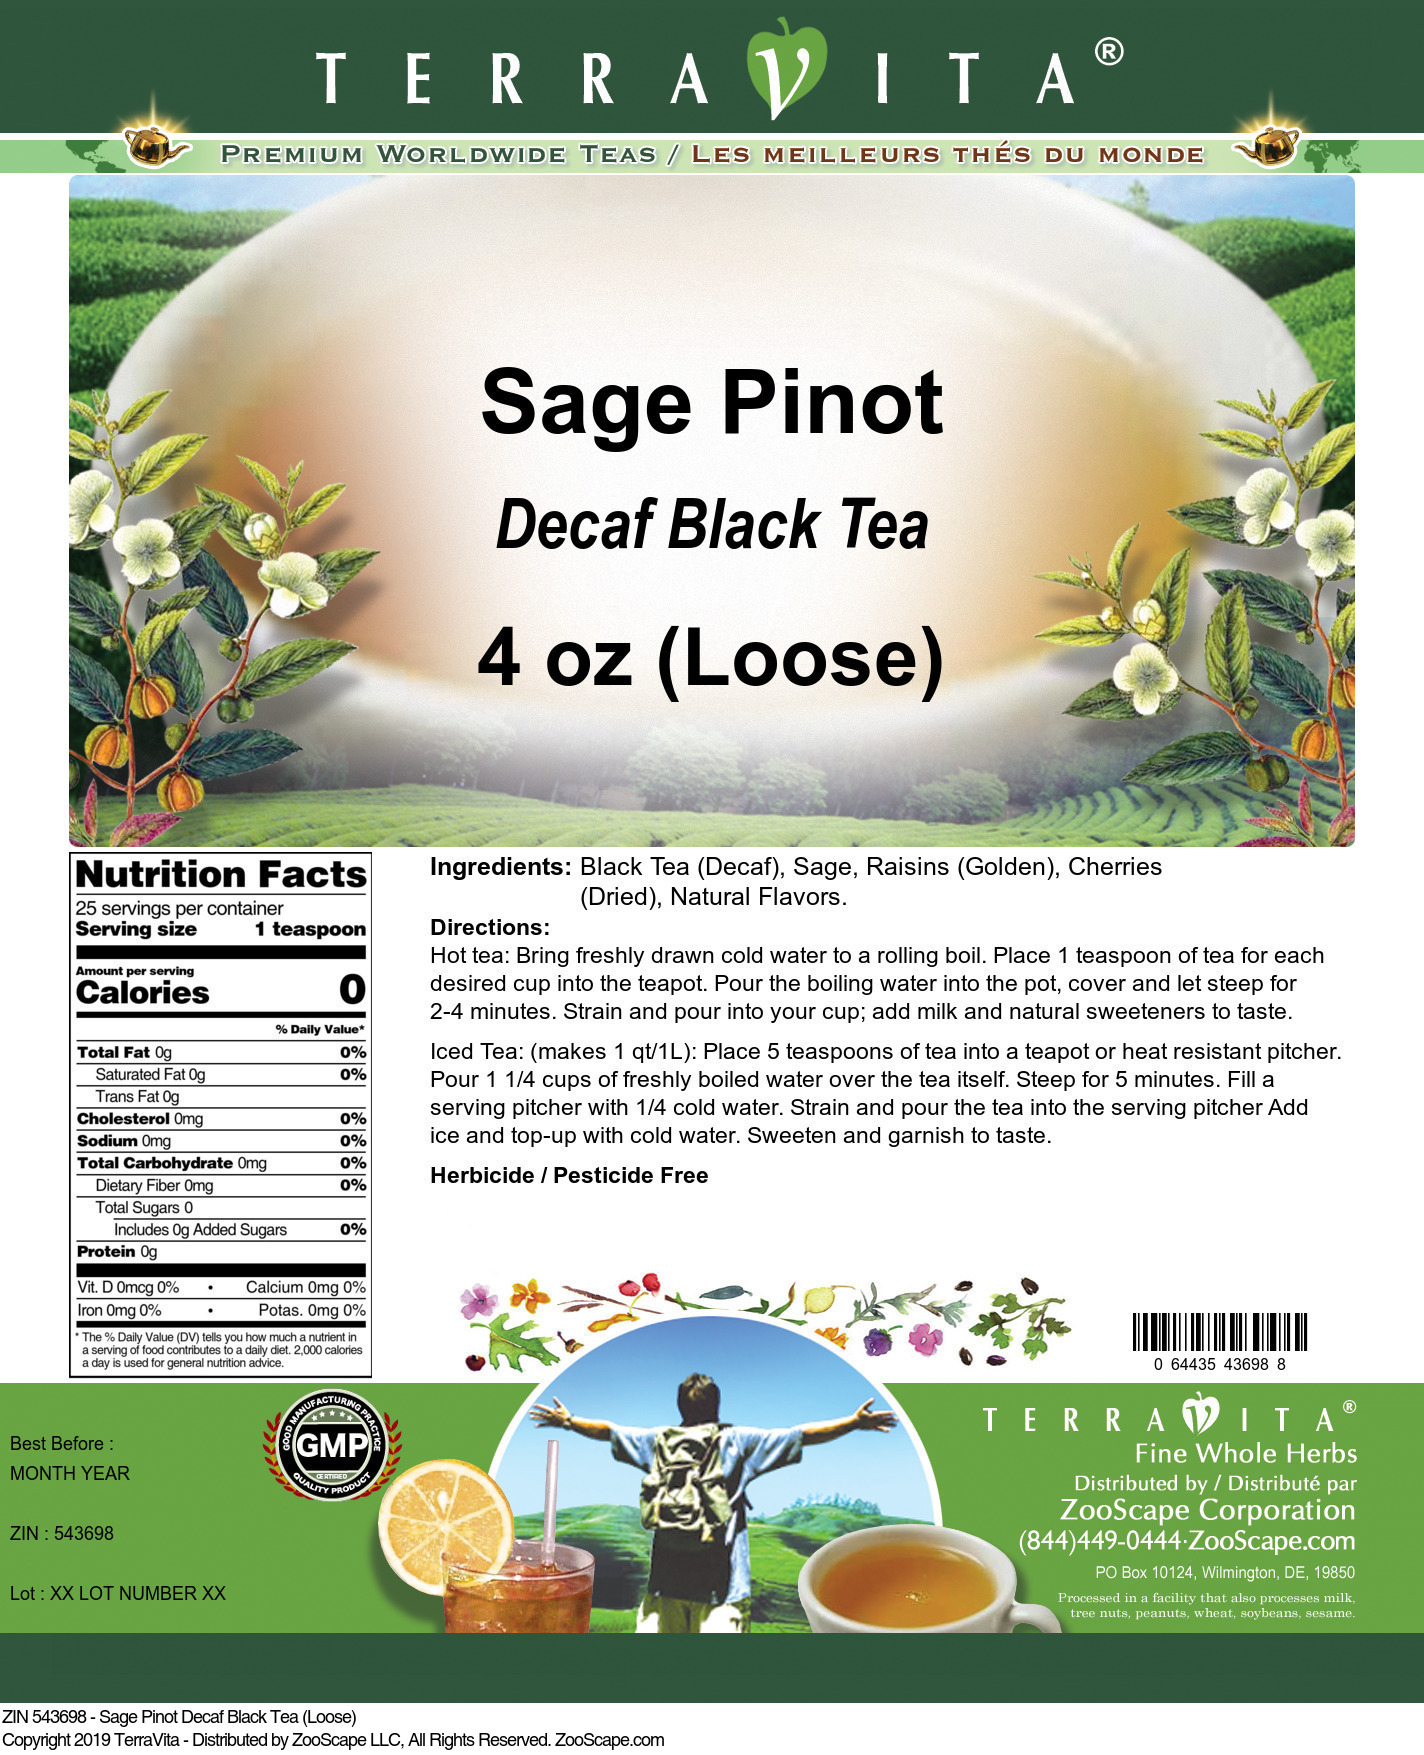 Sage Pinot Decaf Black Tea